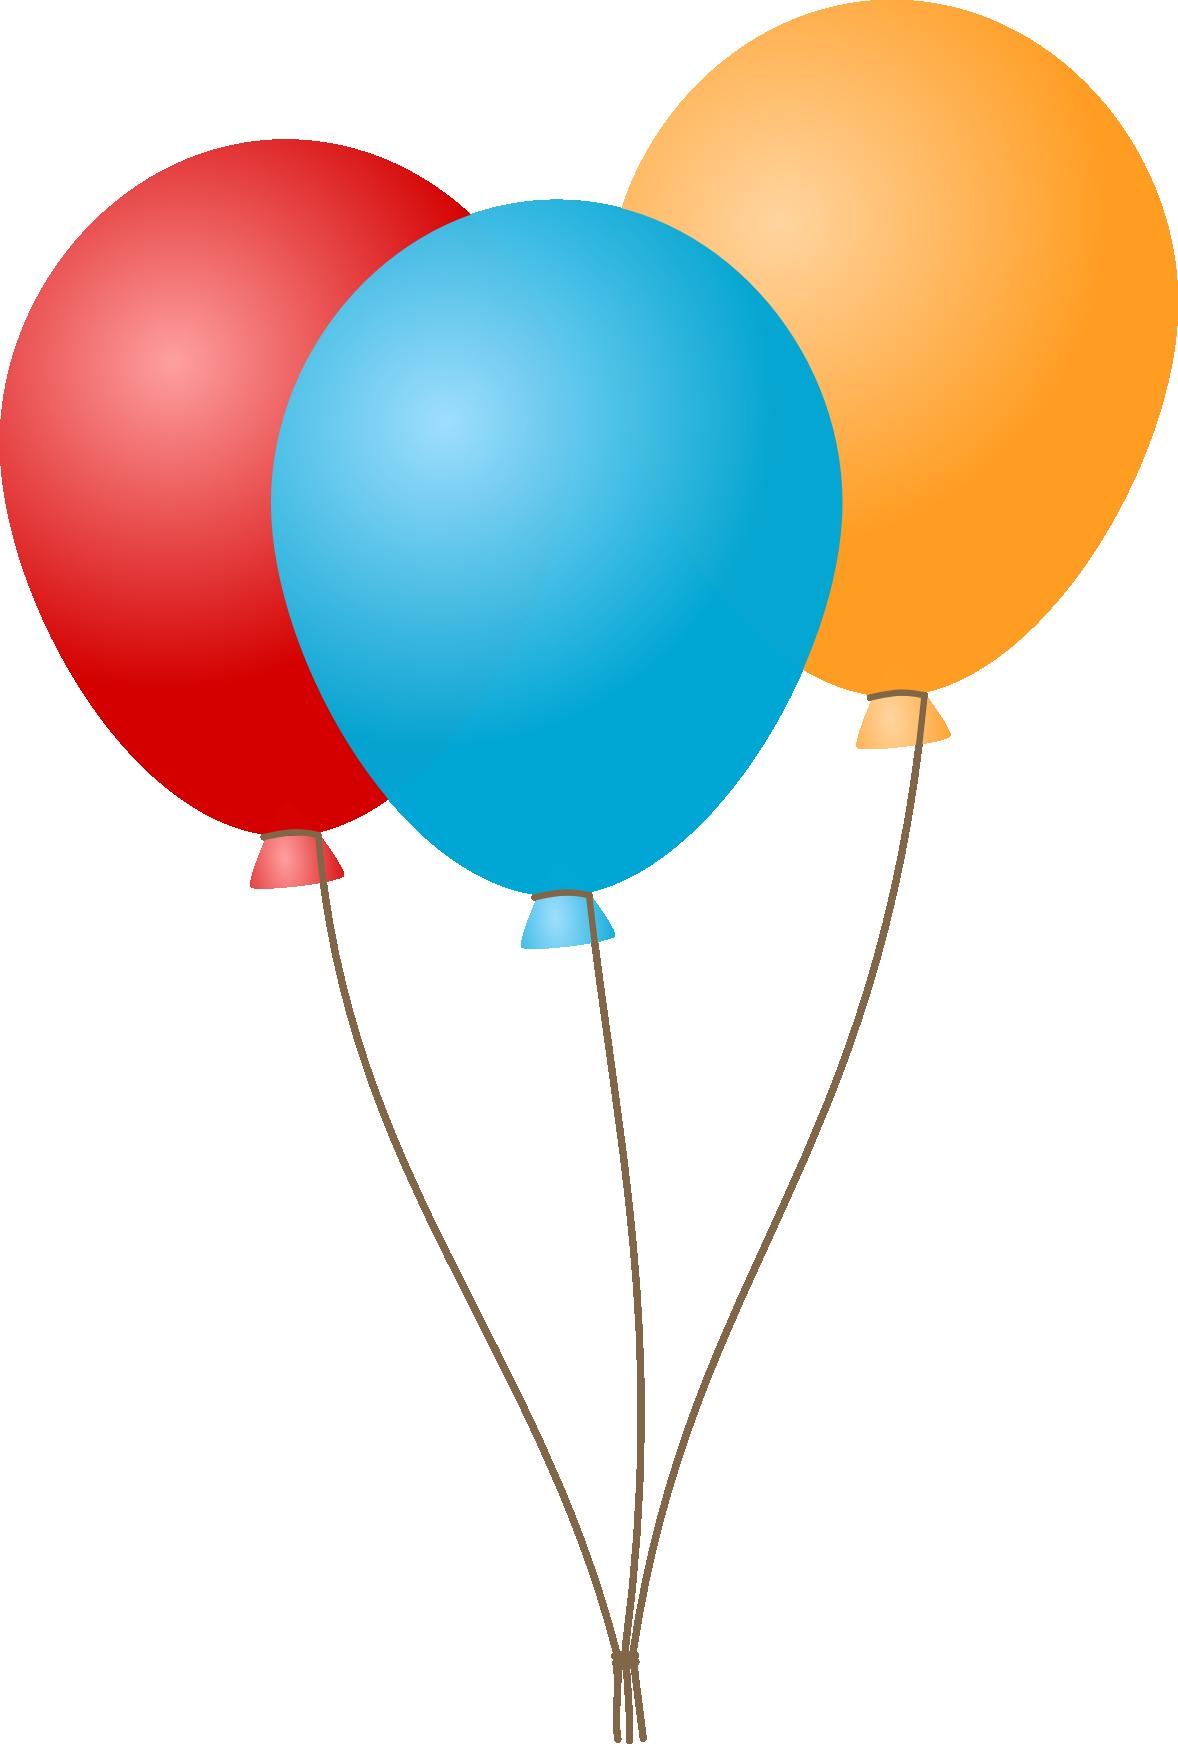 Balloon PNG - 1927